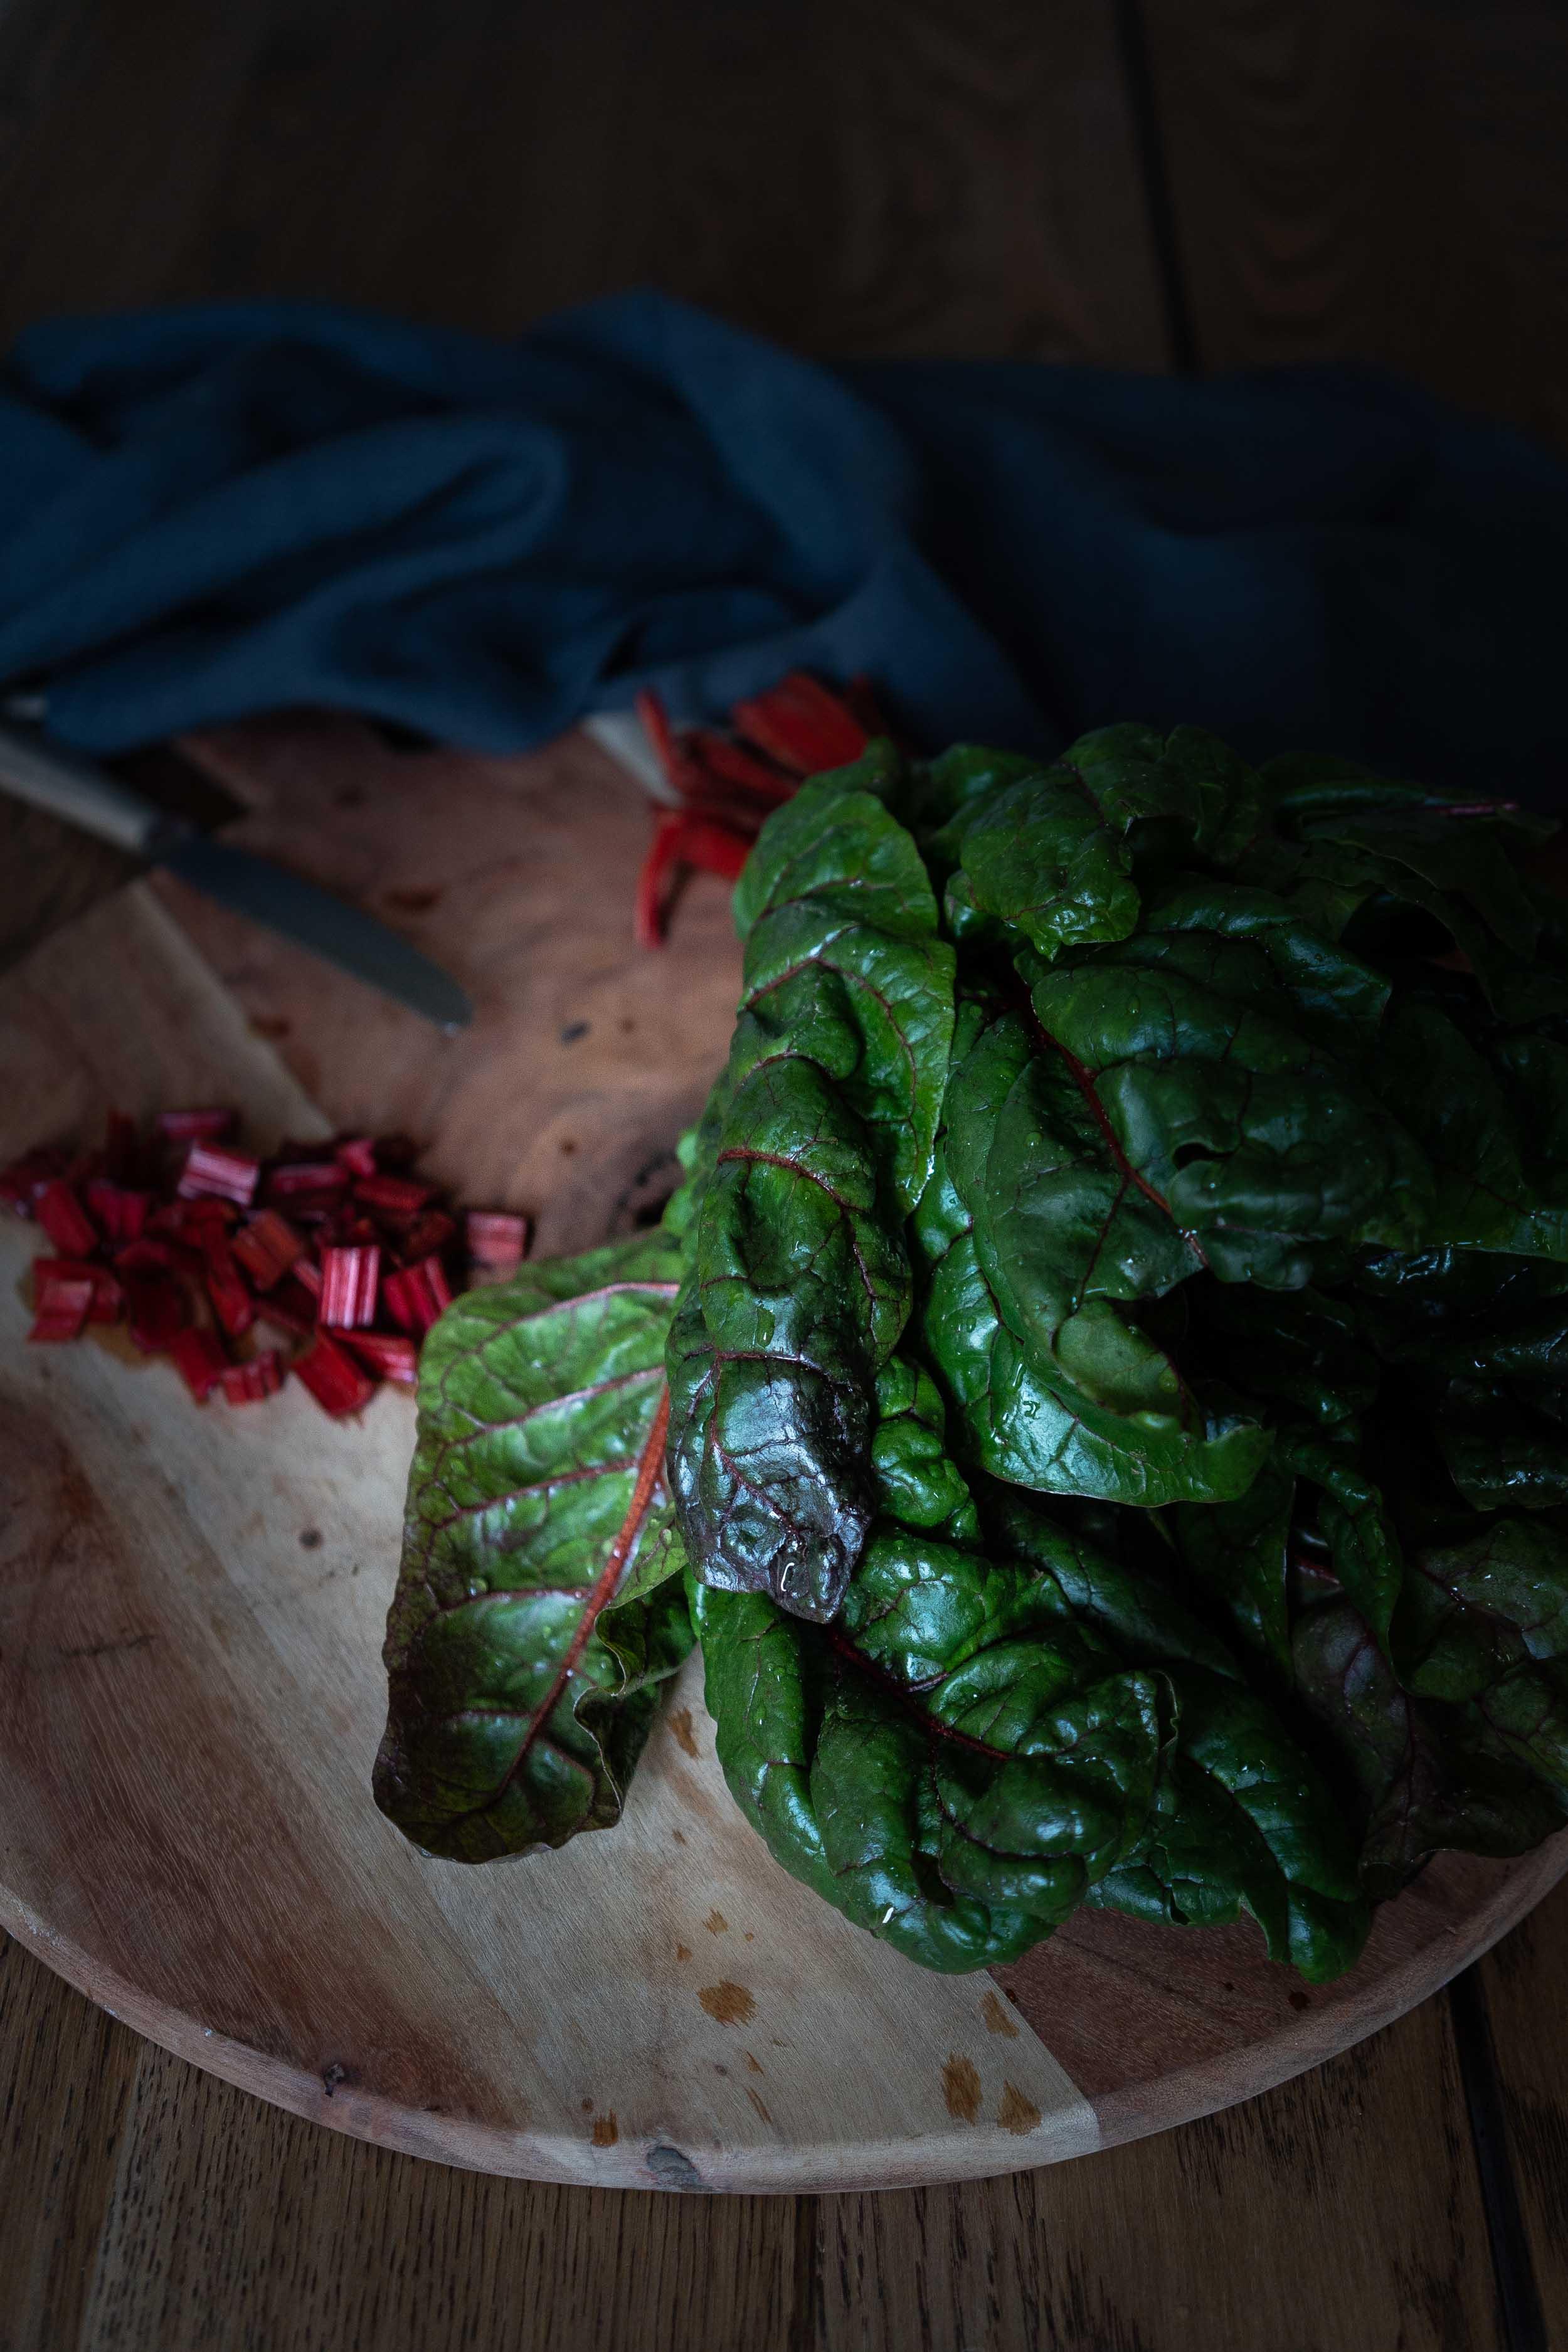 Rhubarb-Jam-with-cardamom-and-ginger-05021.jpg